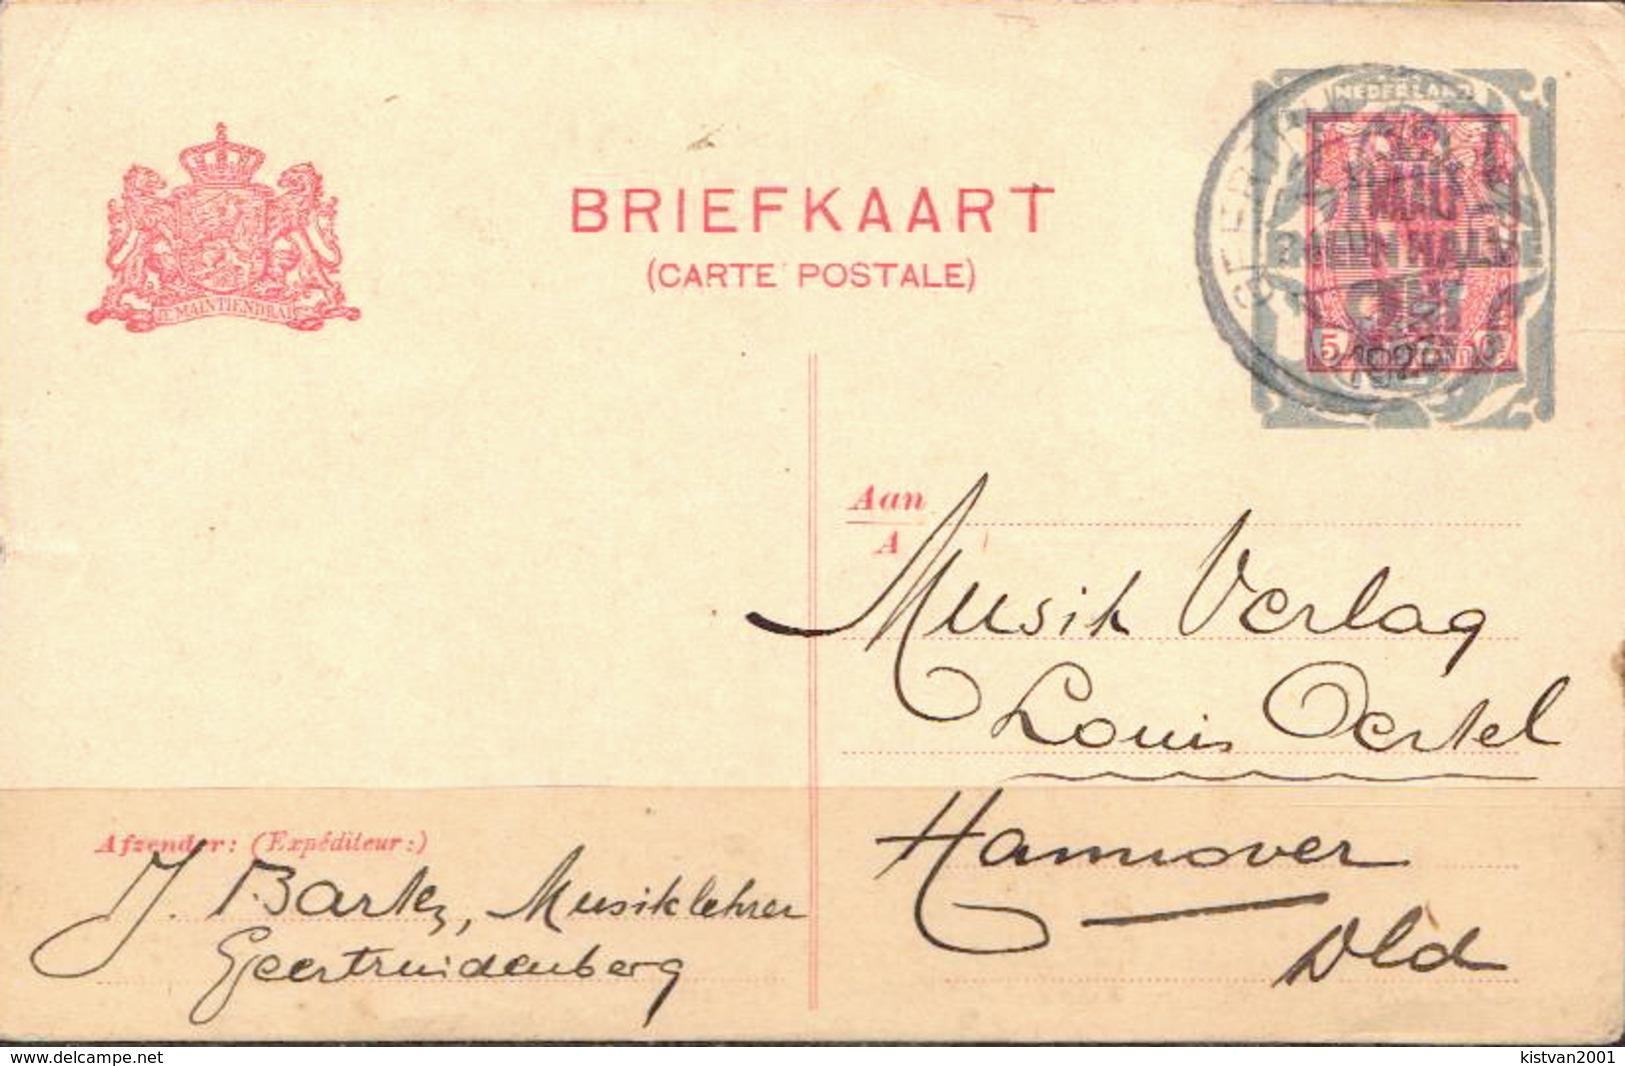 Postal History: Netherlands Overprinted Postal Stationary From 1928 - Postal Stationery